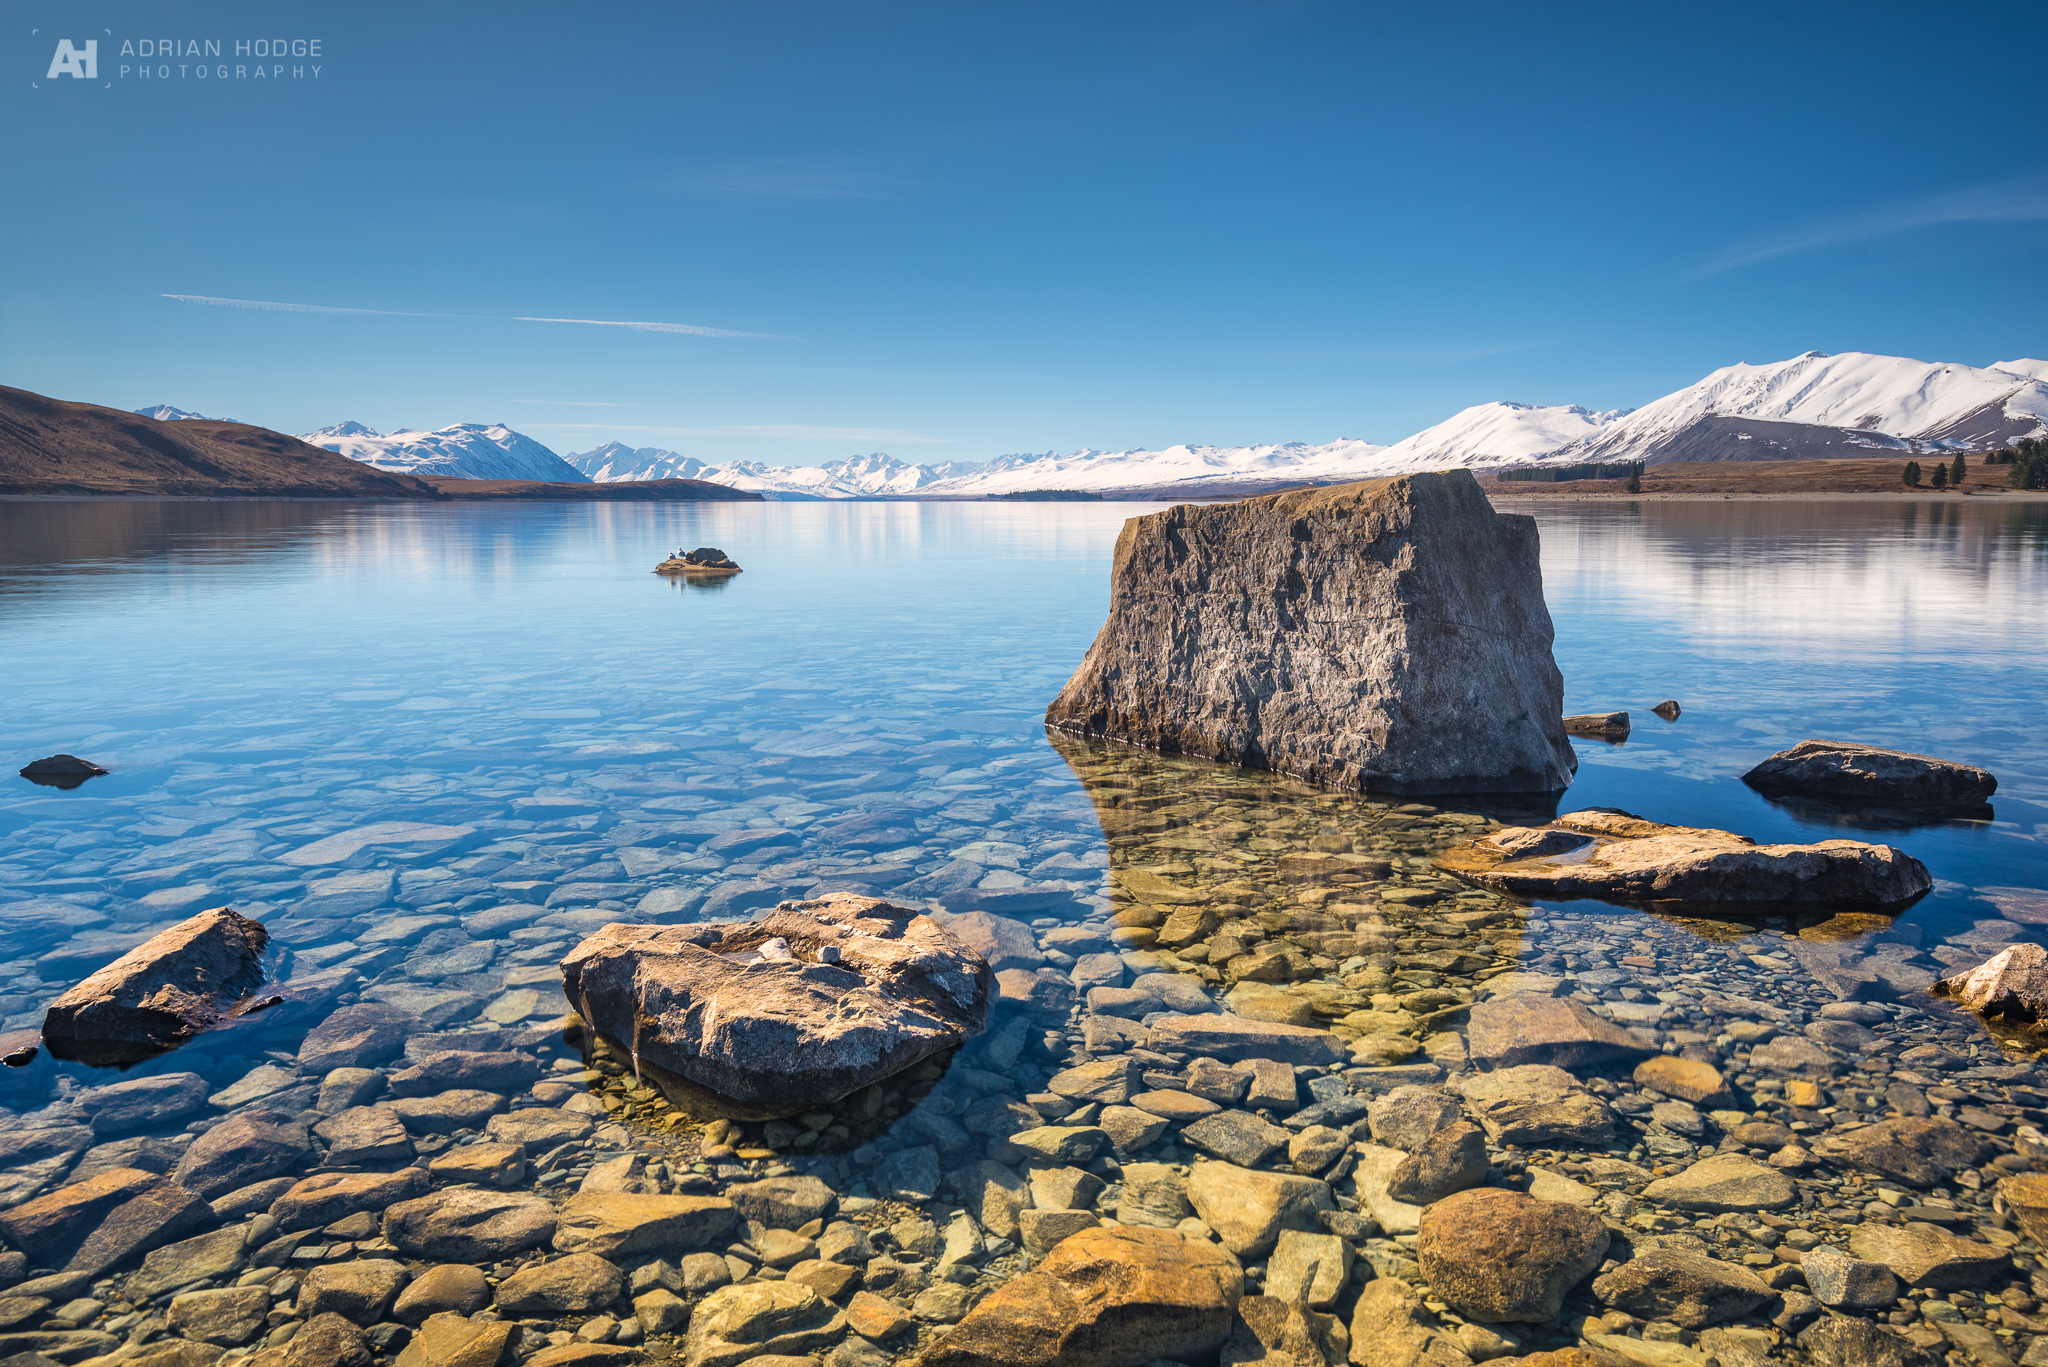 Crystal clear waters of Lake Tekapo